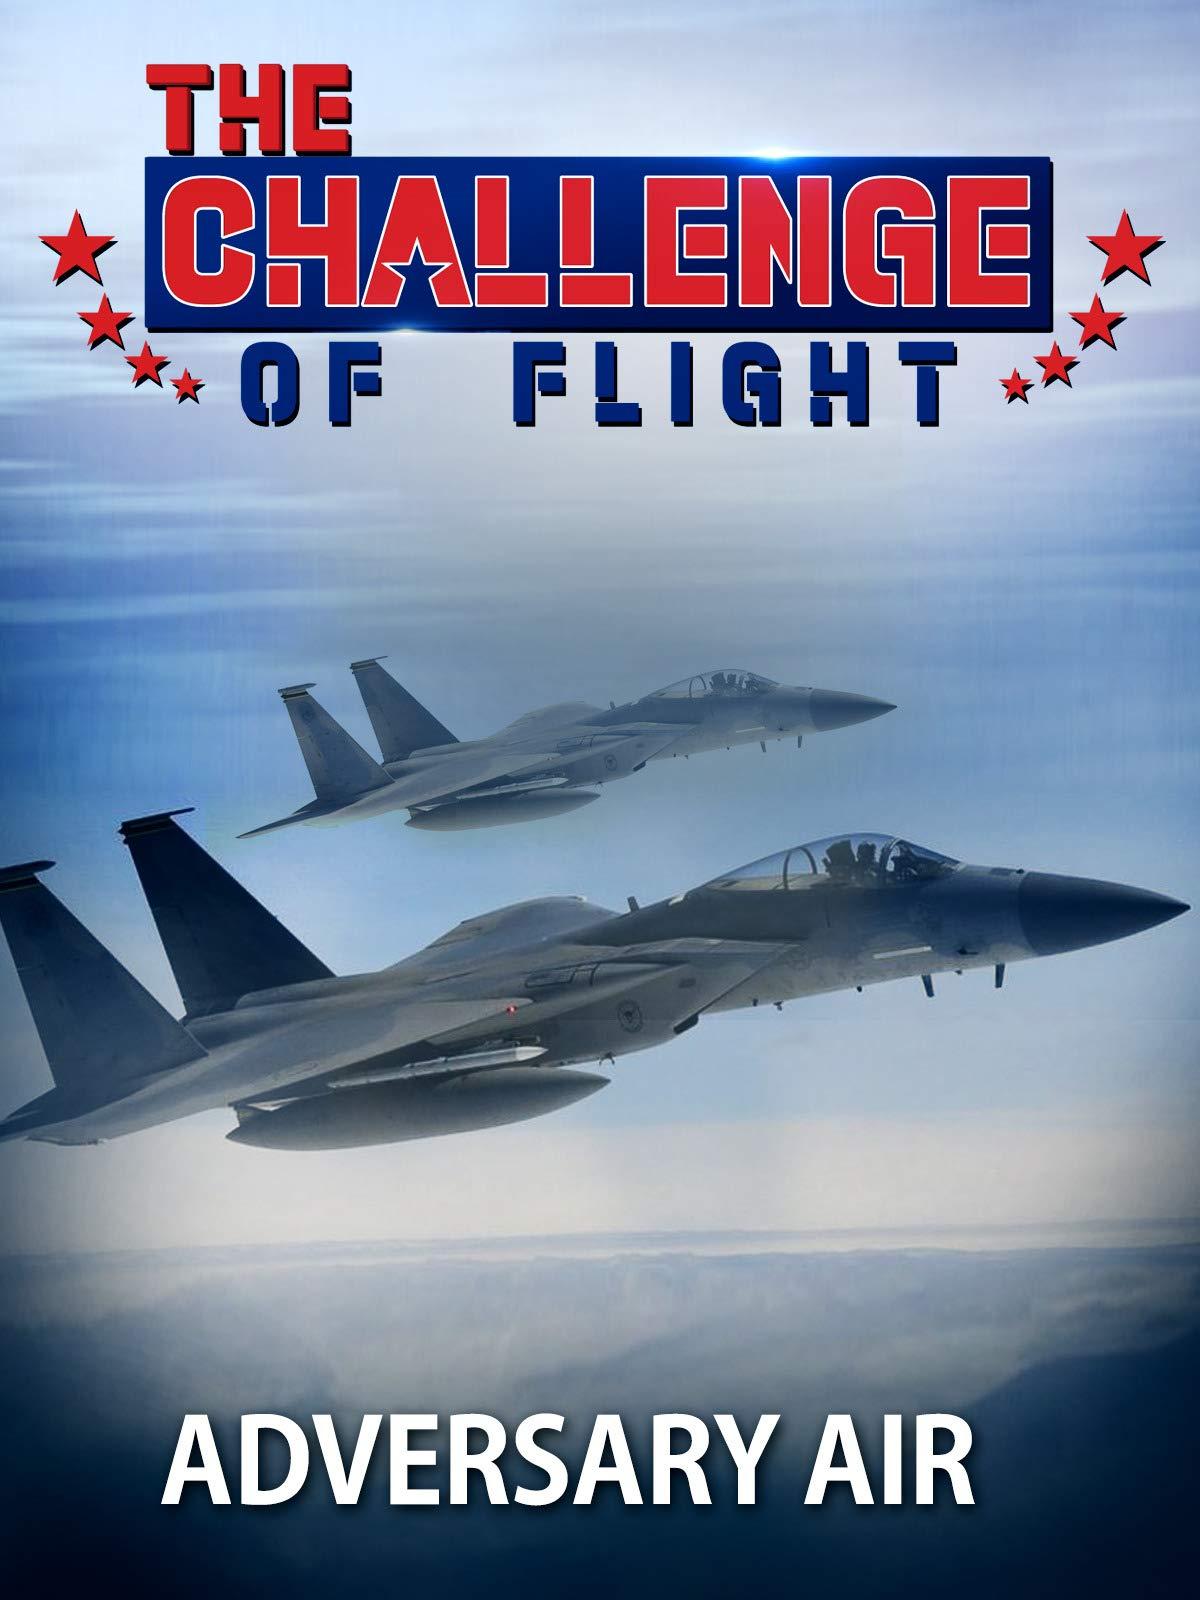 The Challenge of Flight - Adversary Air